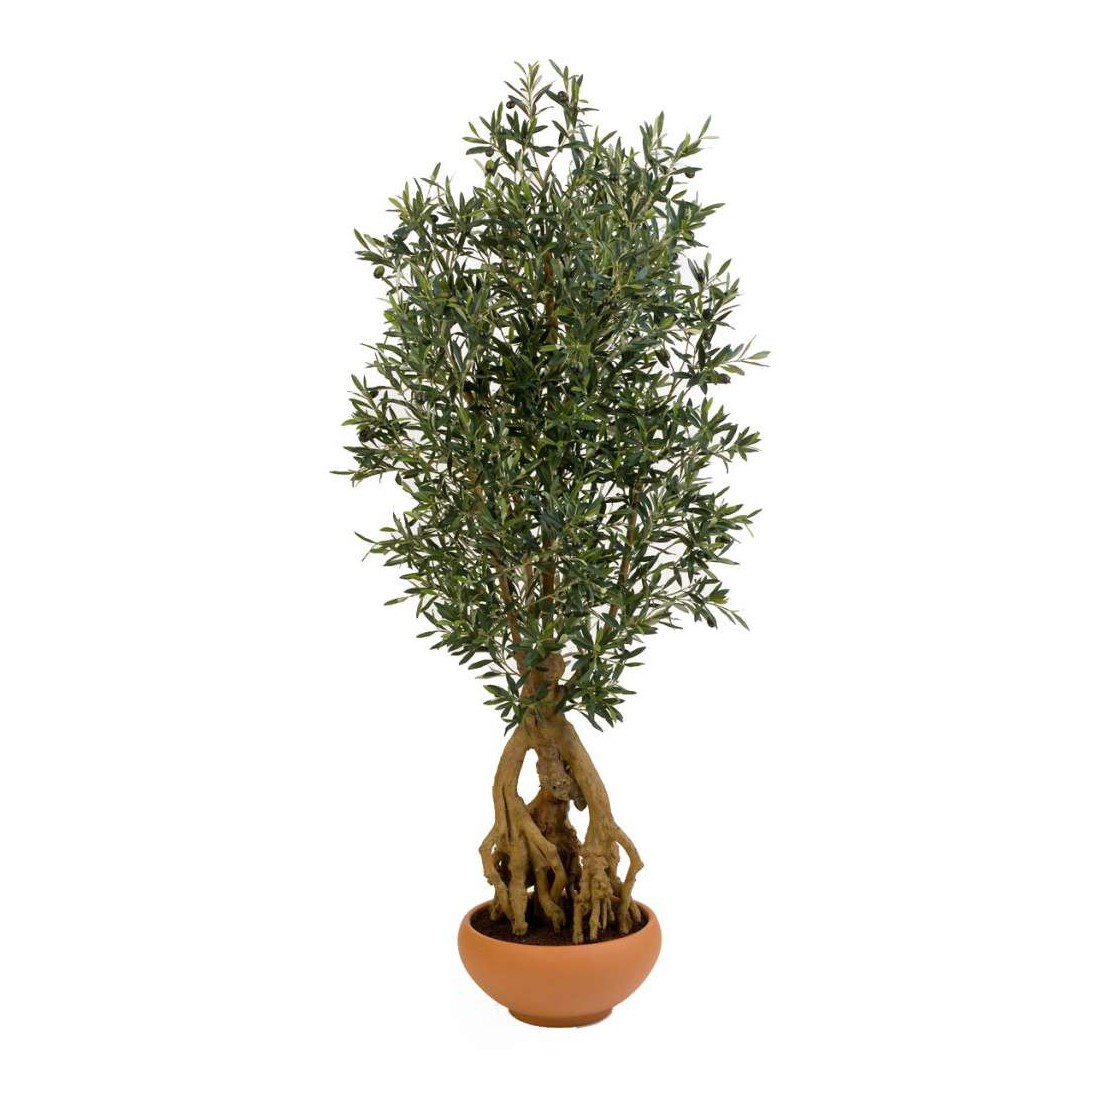 Olivier artificiel new racine 175 cm arbres mediterraneens for Arbre factice